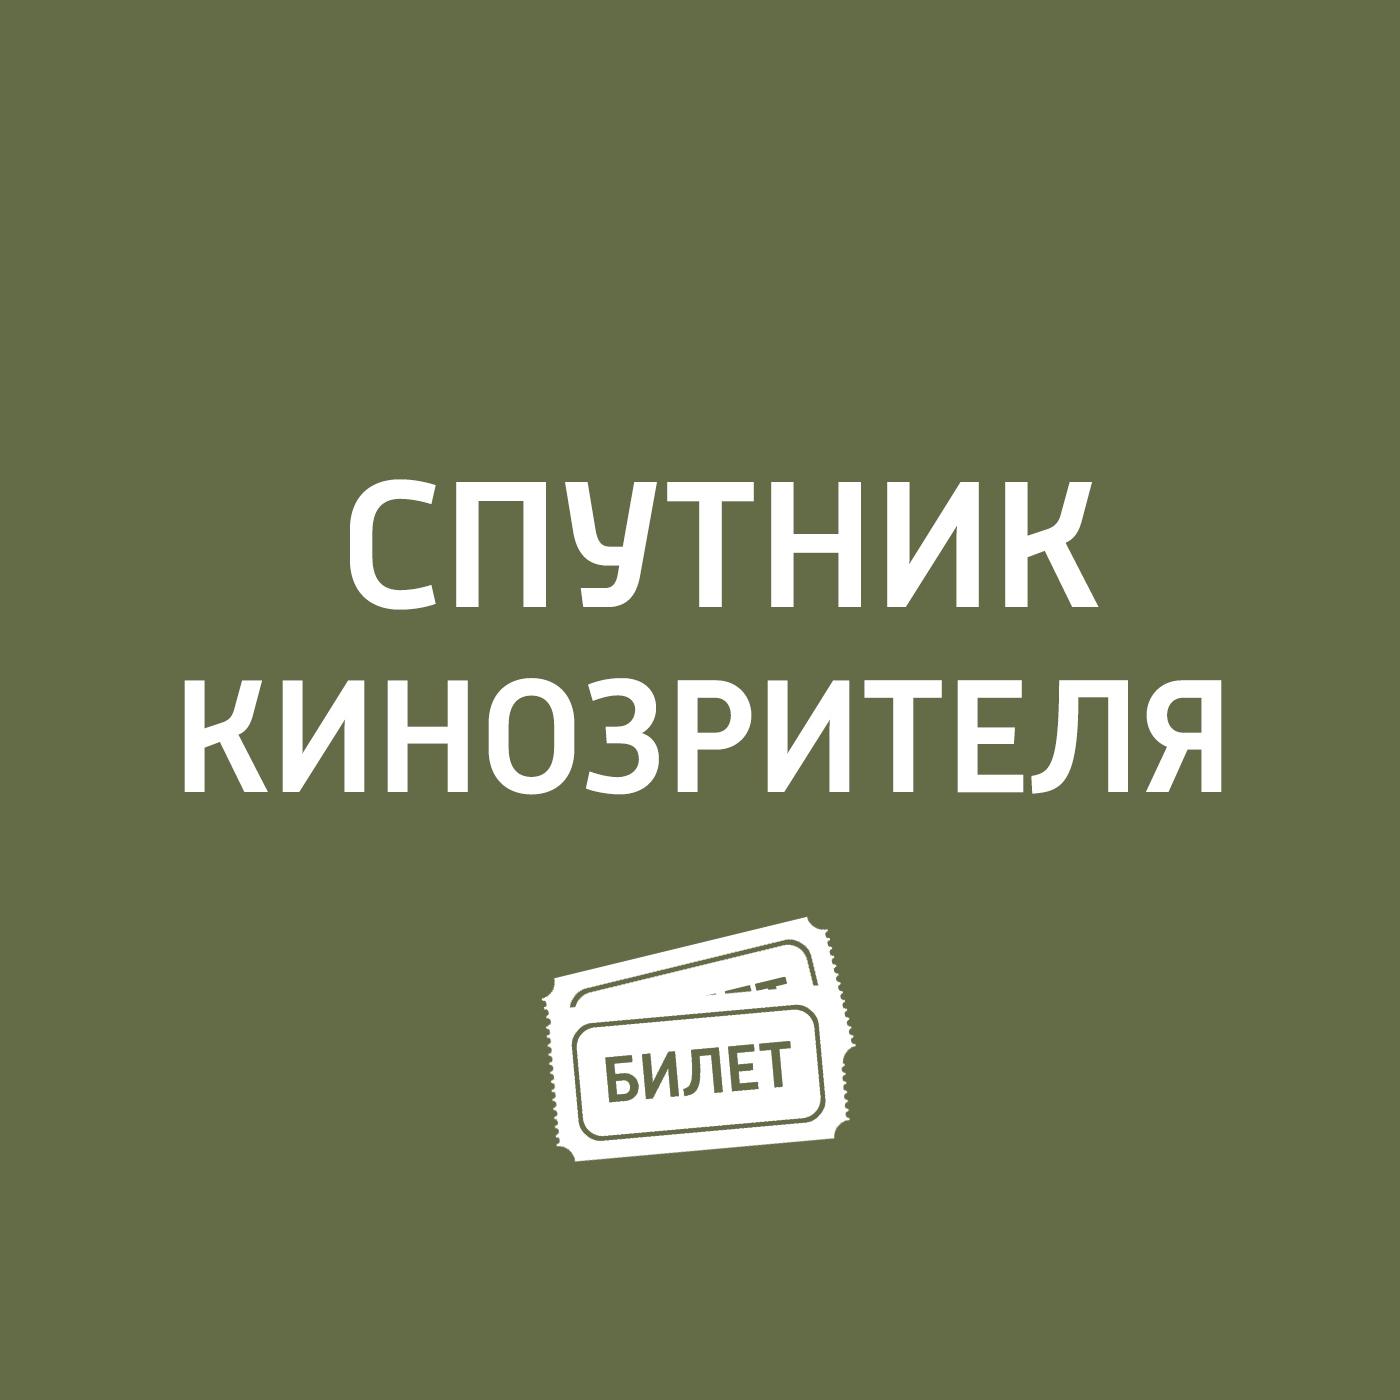 Антон Долин Итоги «Кинотавра